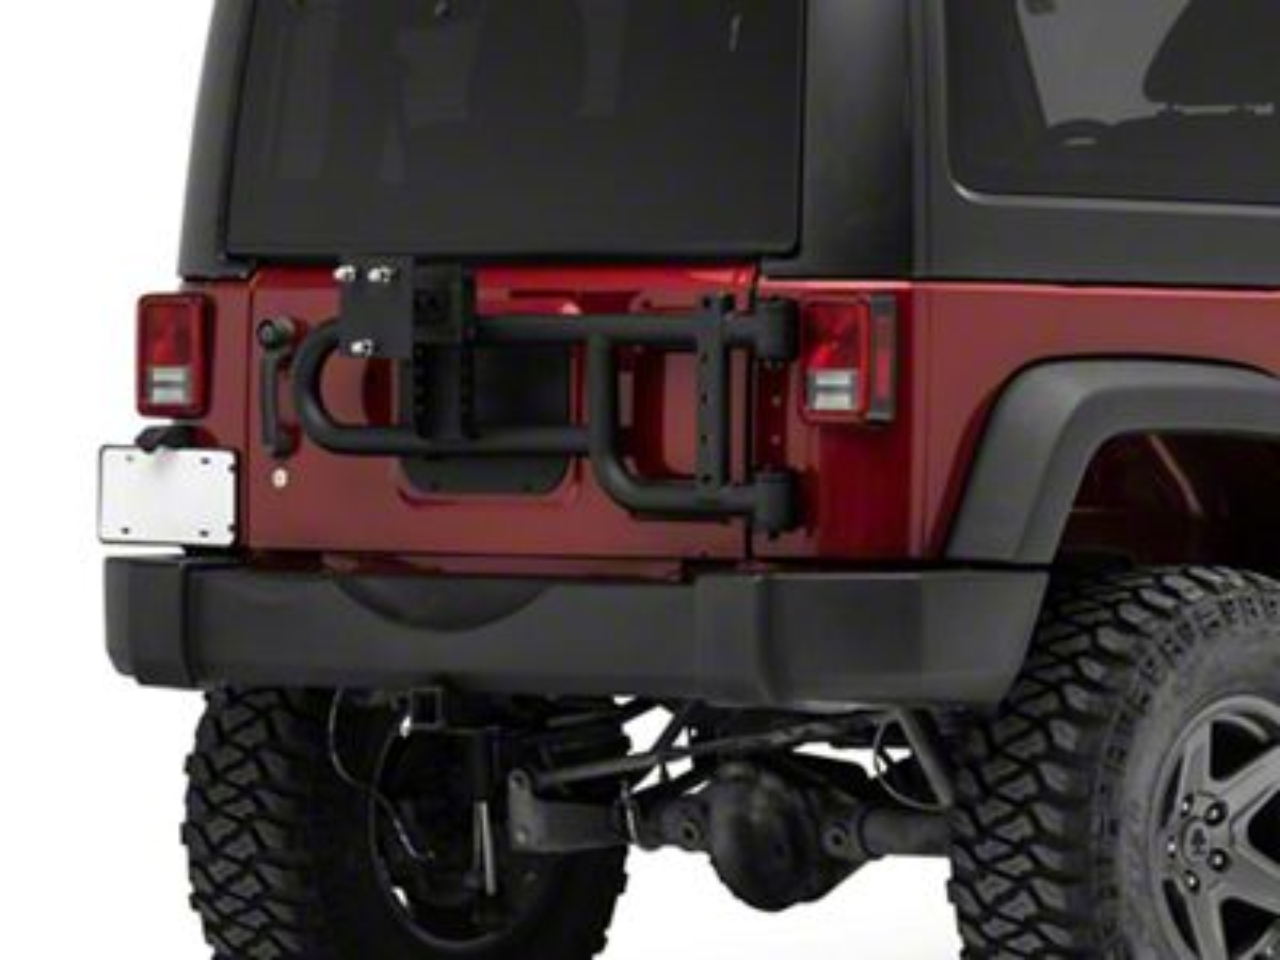 RedRock 4x4 HD Tire Carrier for OEM Tail Gate (07-18 Jeep Wrangler JK)